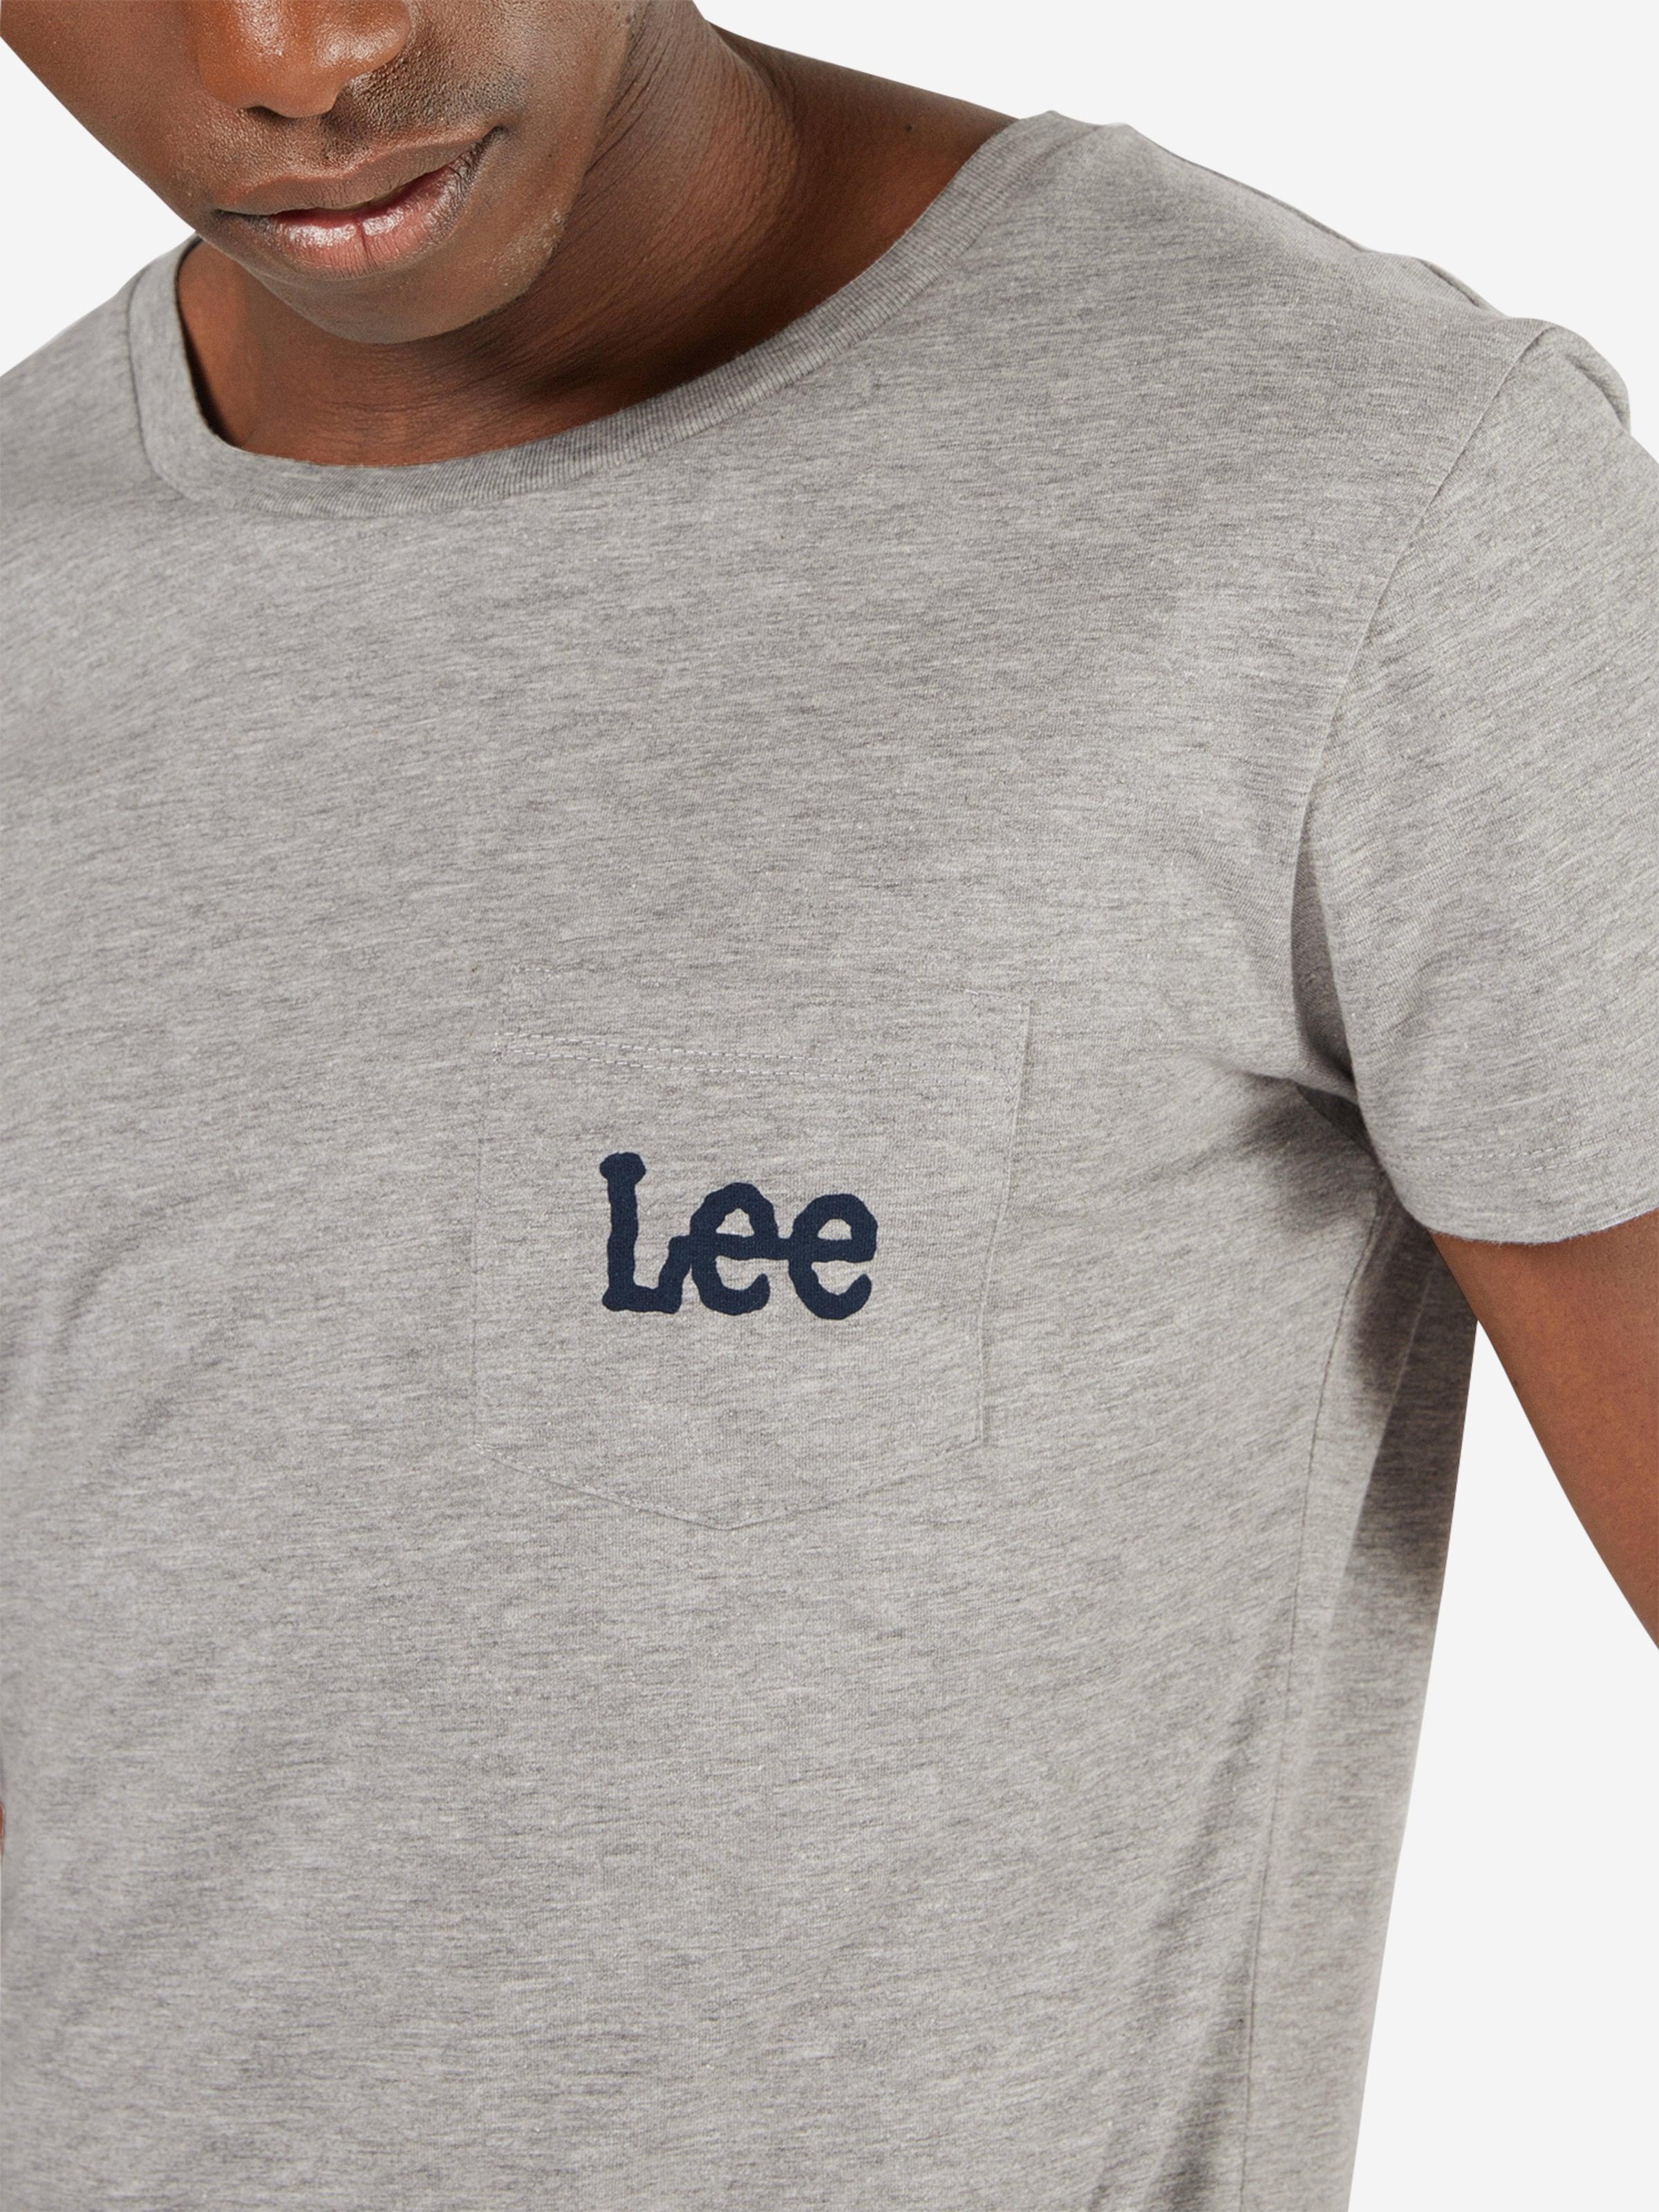 Bester Ort Lee T-Shirt 'LEE POCKET TEE' Qualitativ Hochwertige Online Spielraum Perfekt 7WfTFa